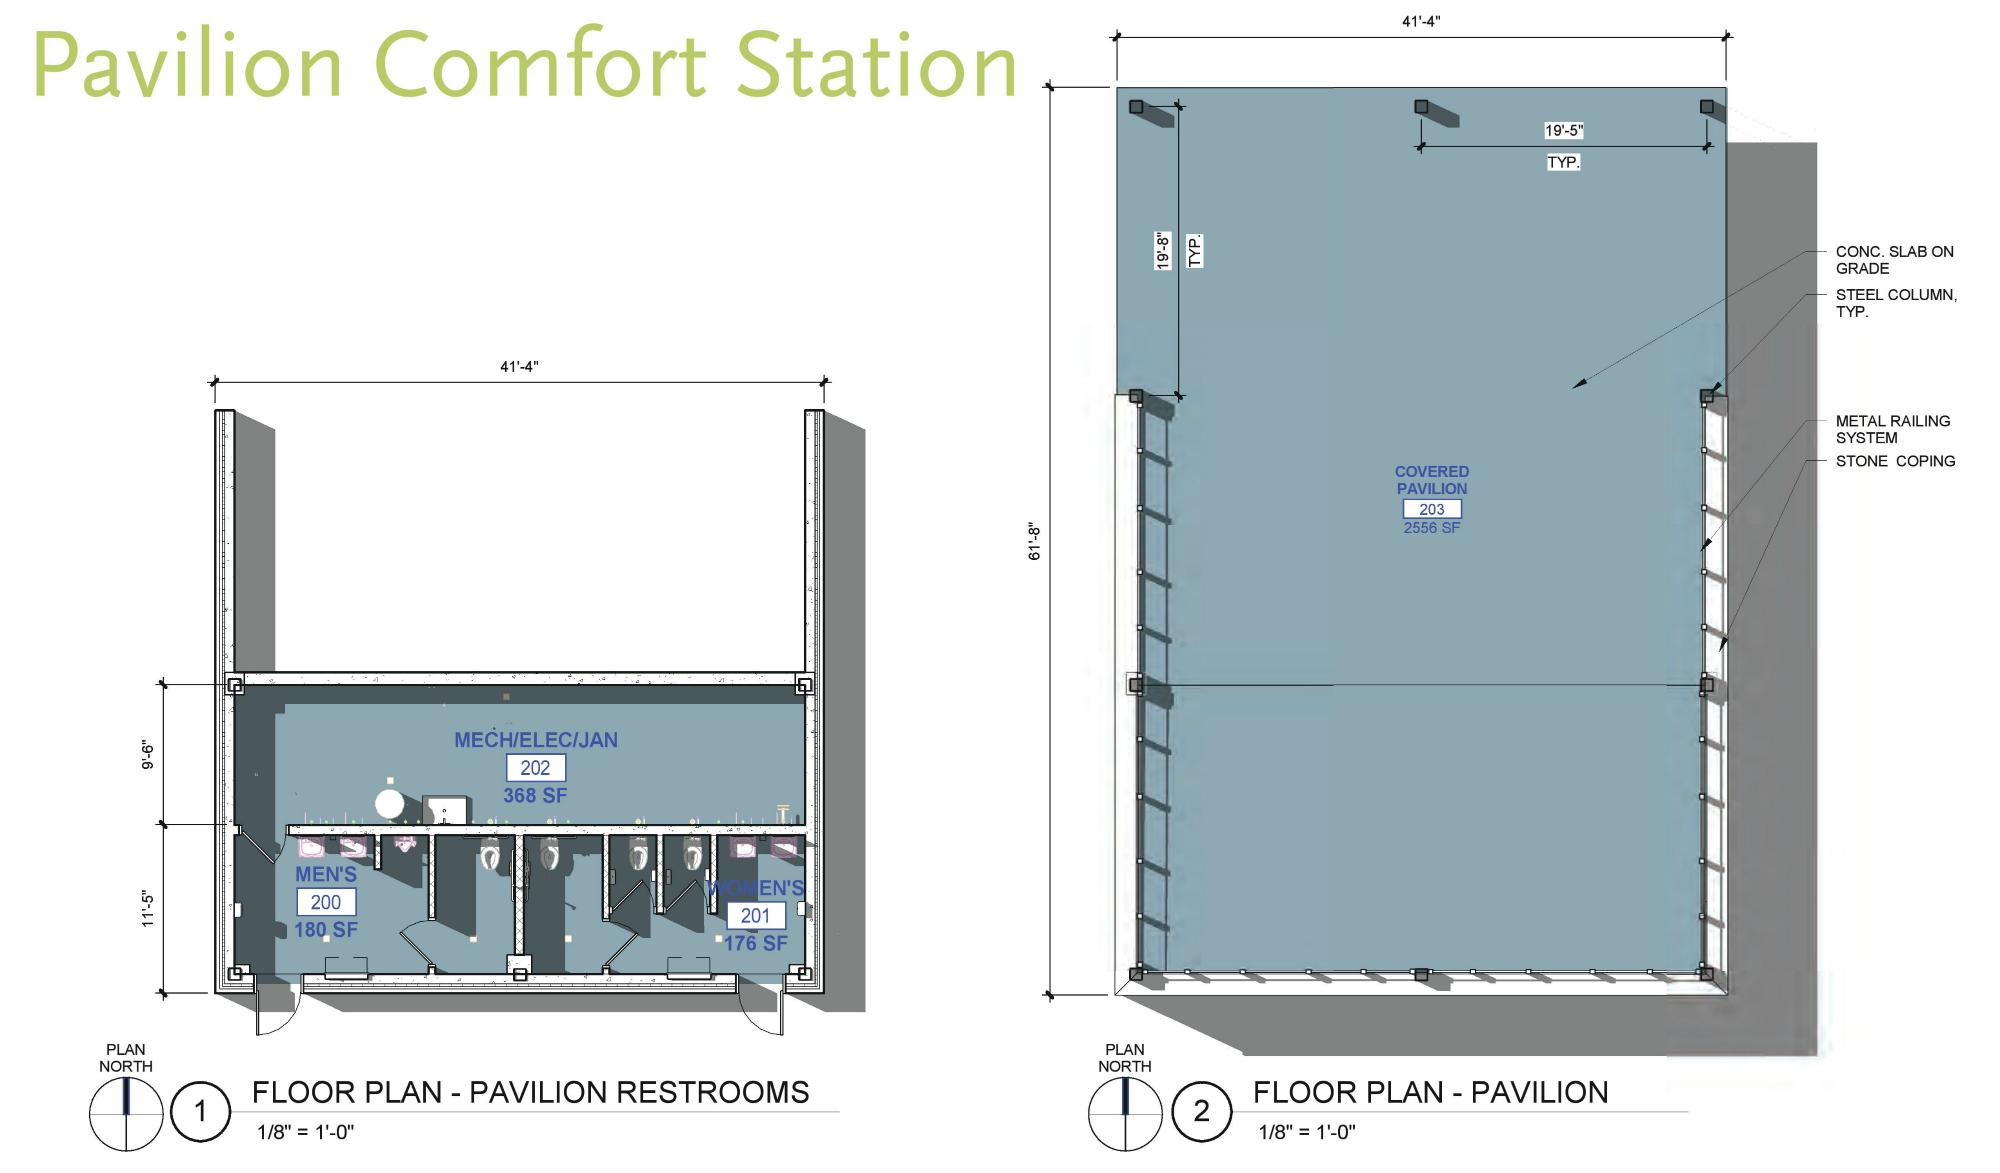 Central Fields_pavilion comfort station floorplan